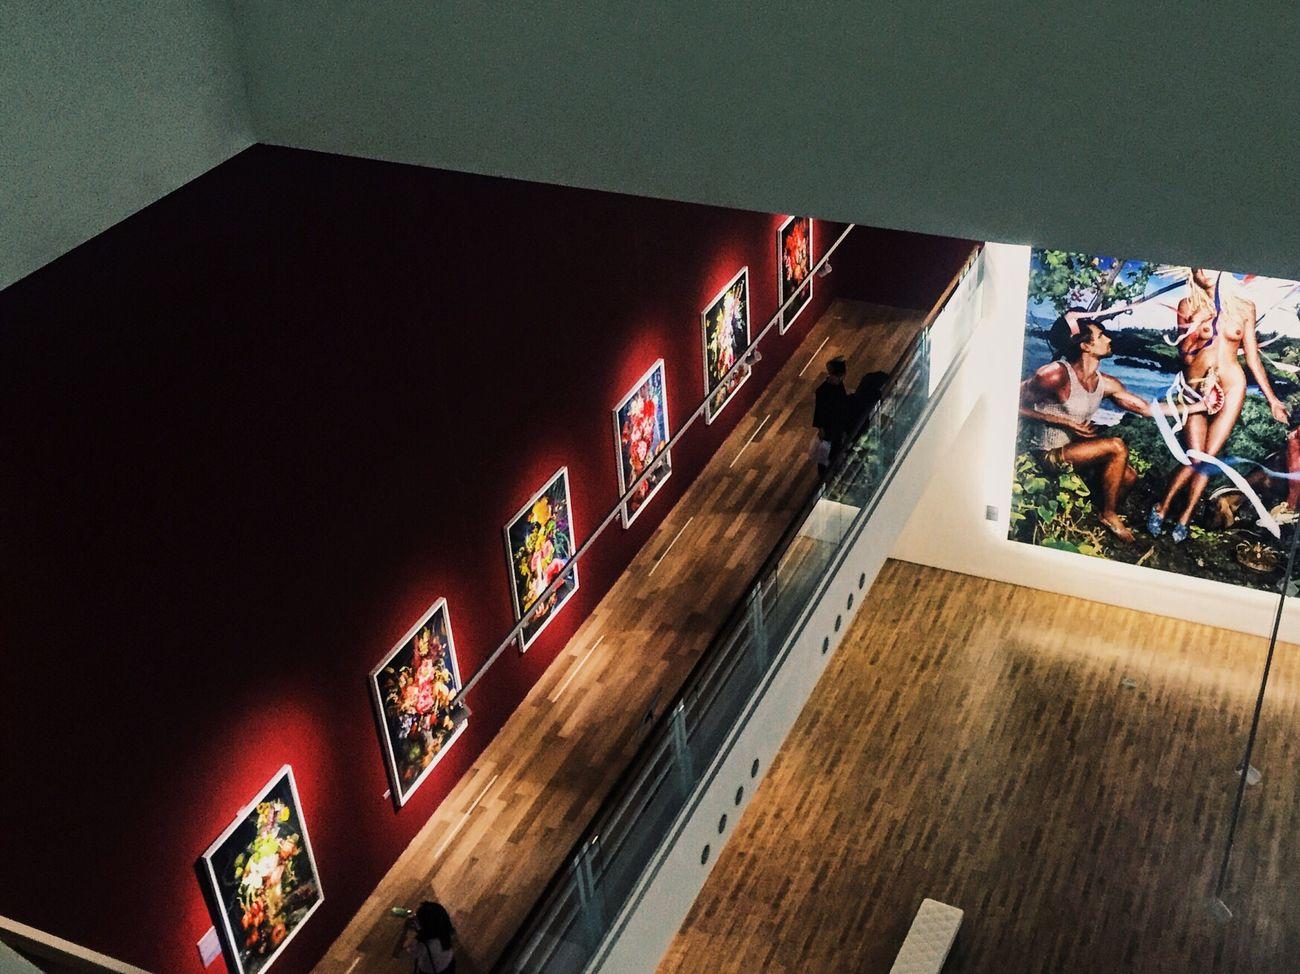 Seoul, Korea David Lachapelle Inscape of Beauty Cool Picture in ara modern art museum M2